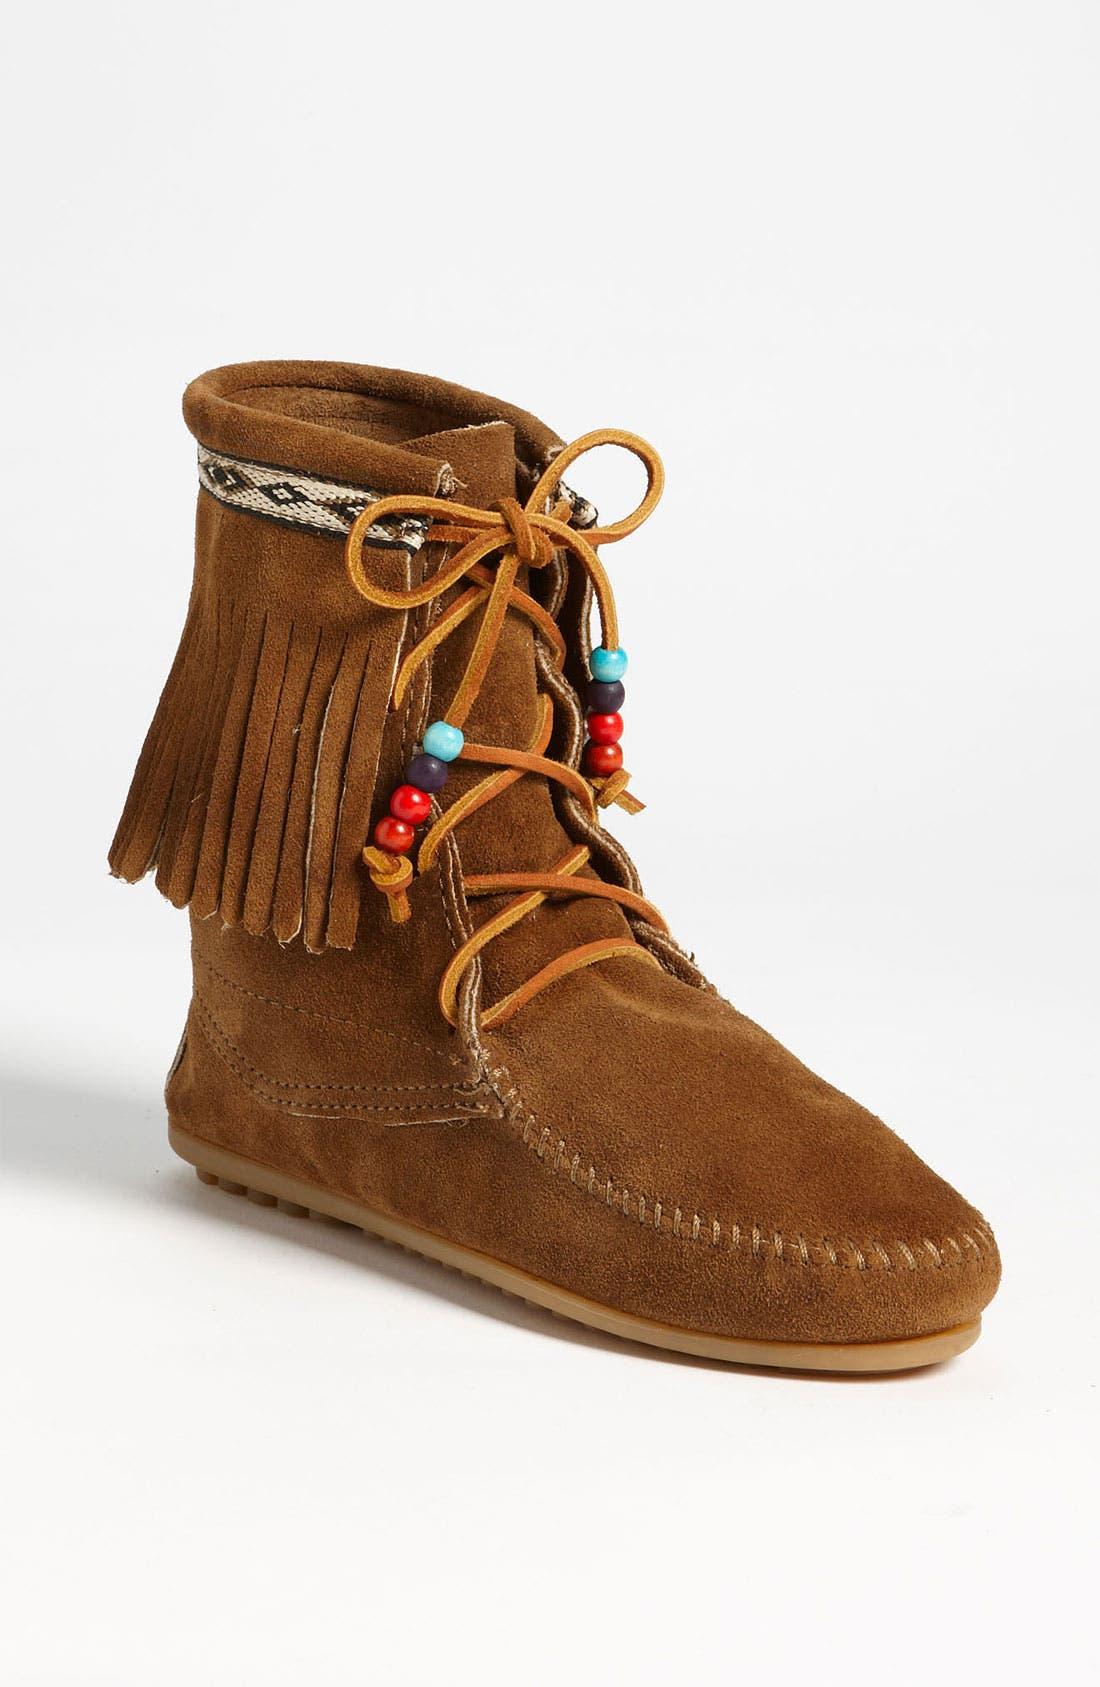 Alternate Image 1 Selected - Minnetonka 'Beaded Tramper' Boot